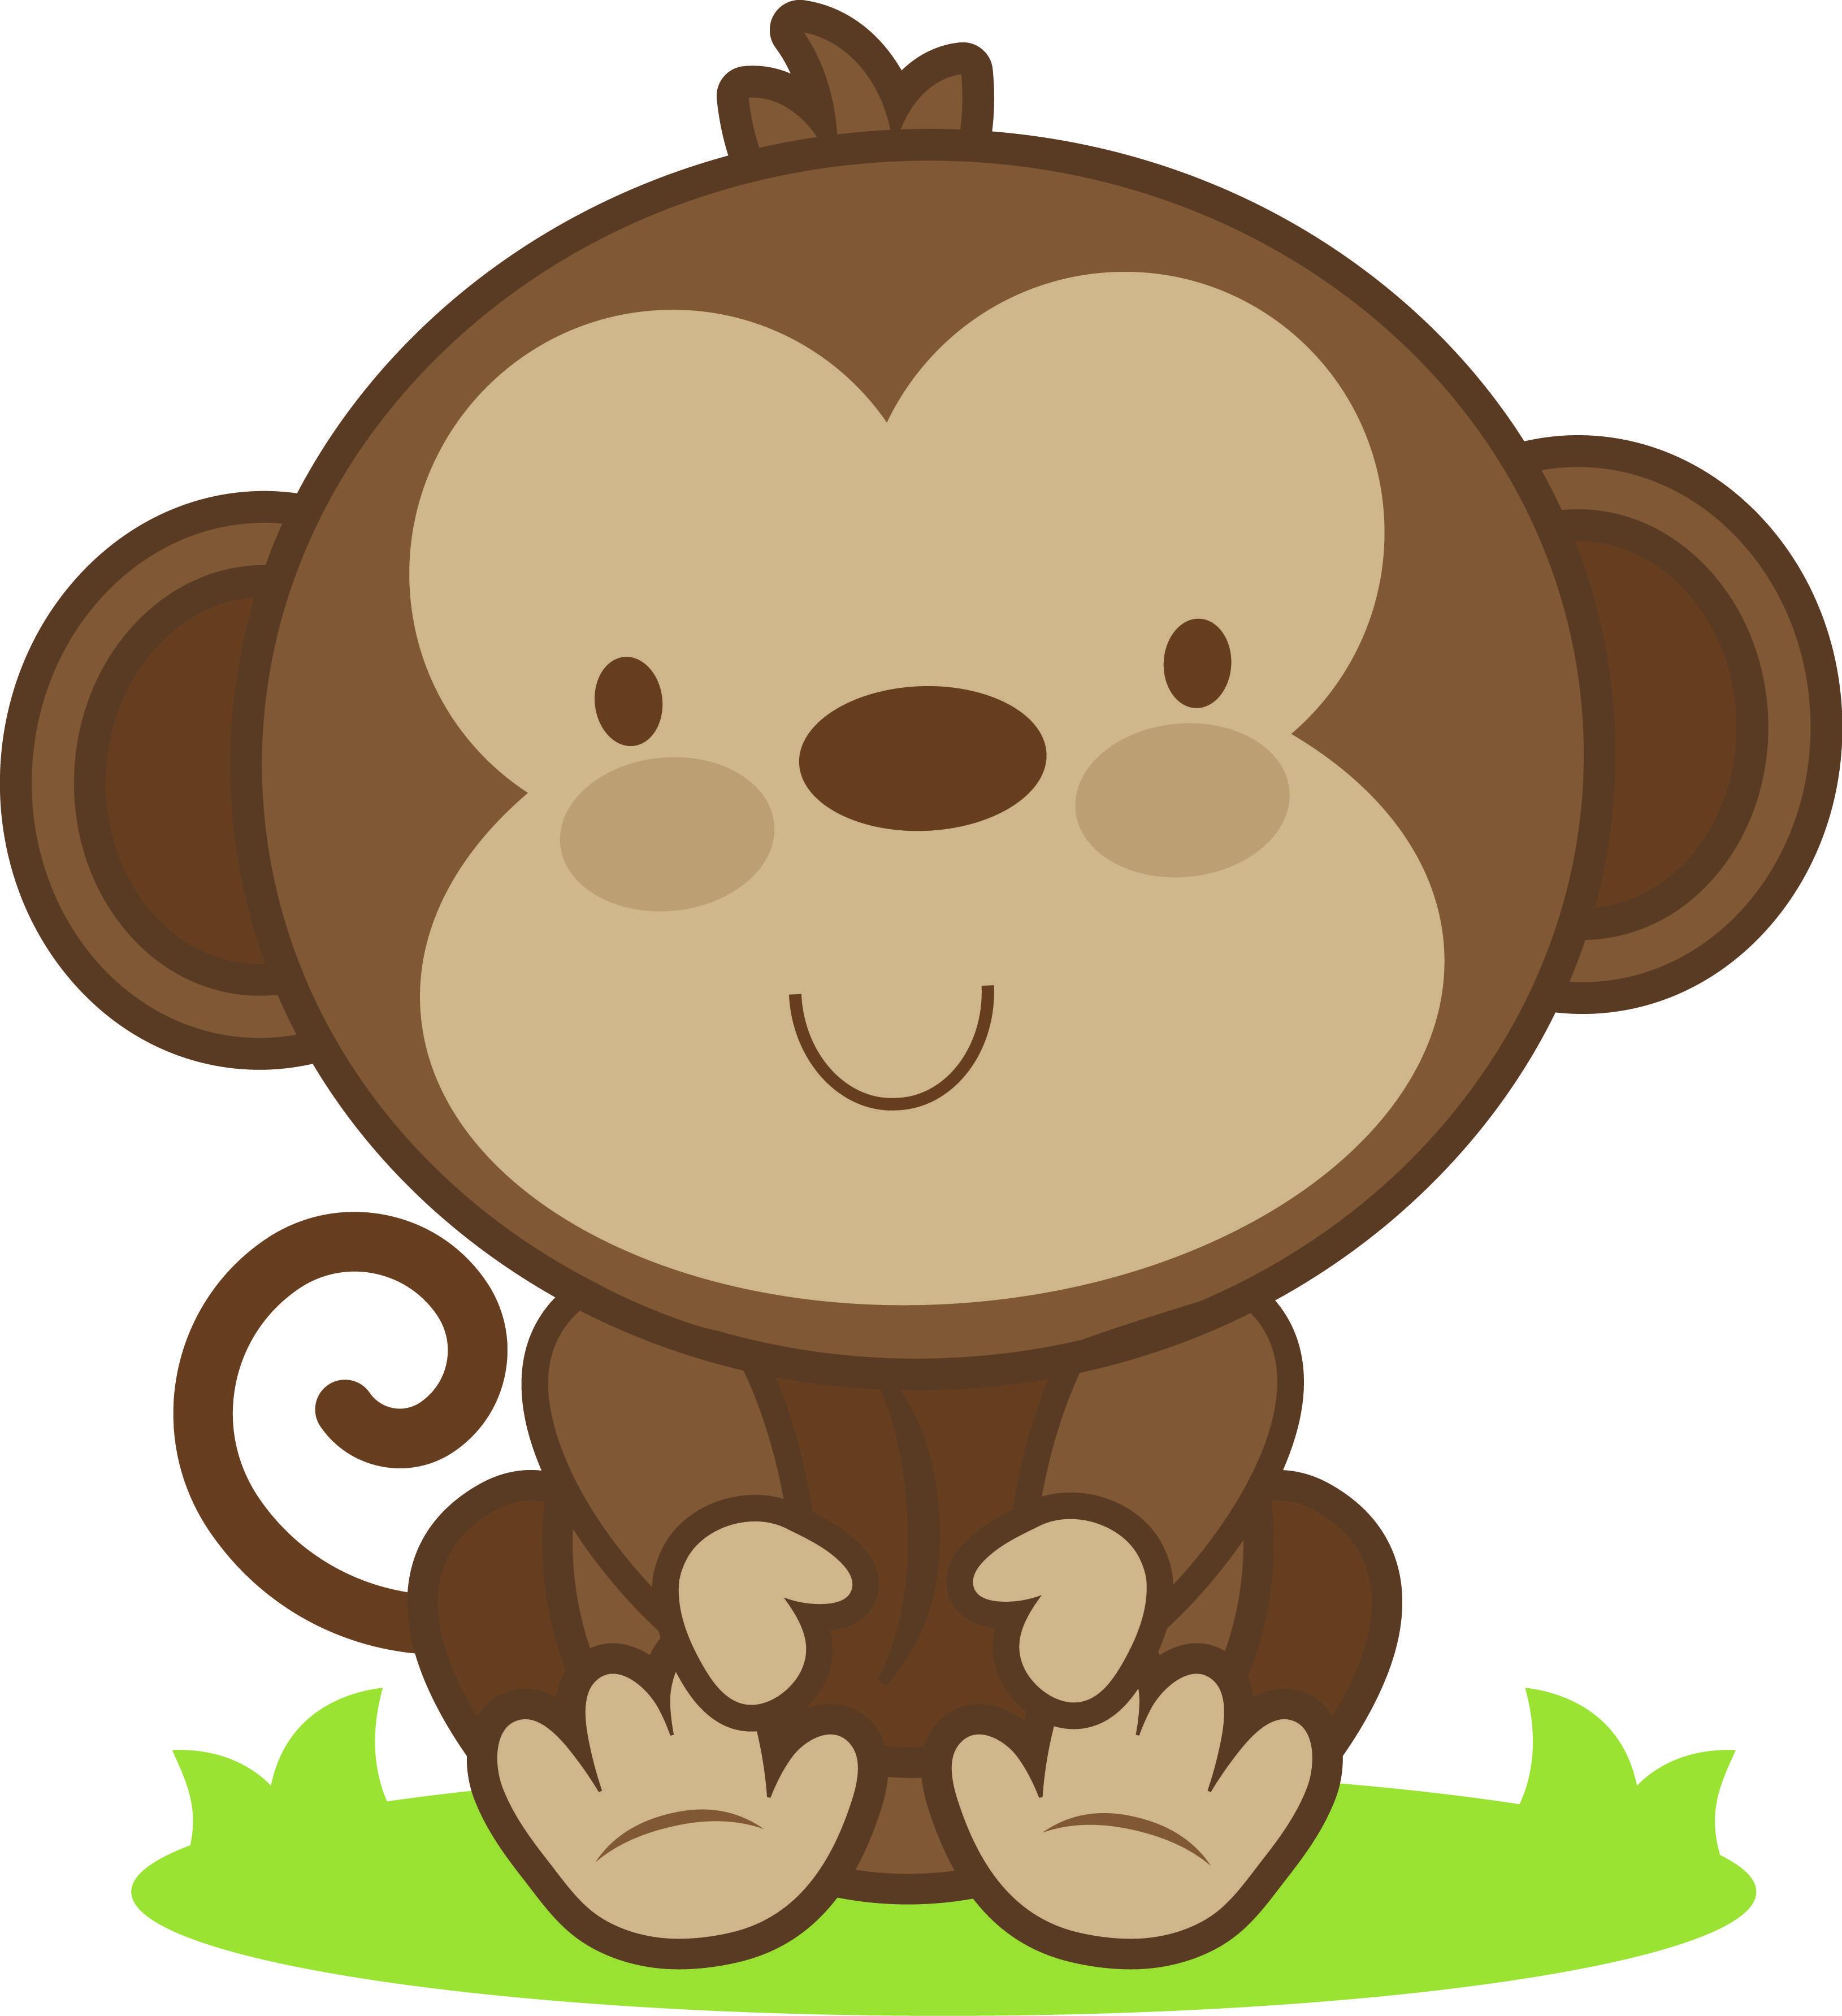 Dibujos Monos Infantiles Good Animales De La Selva Una Ilustracin